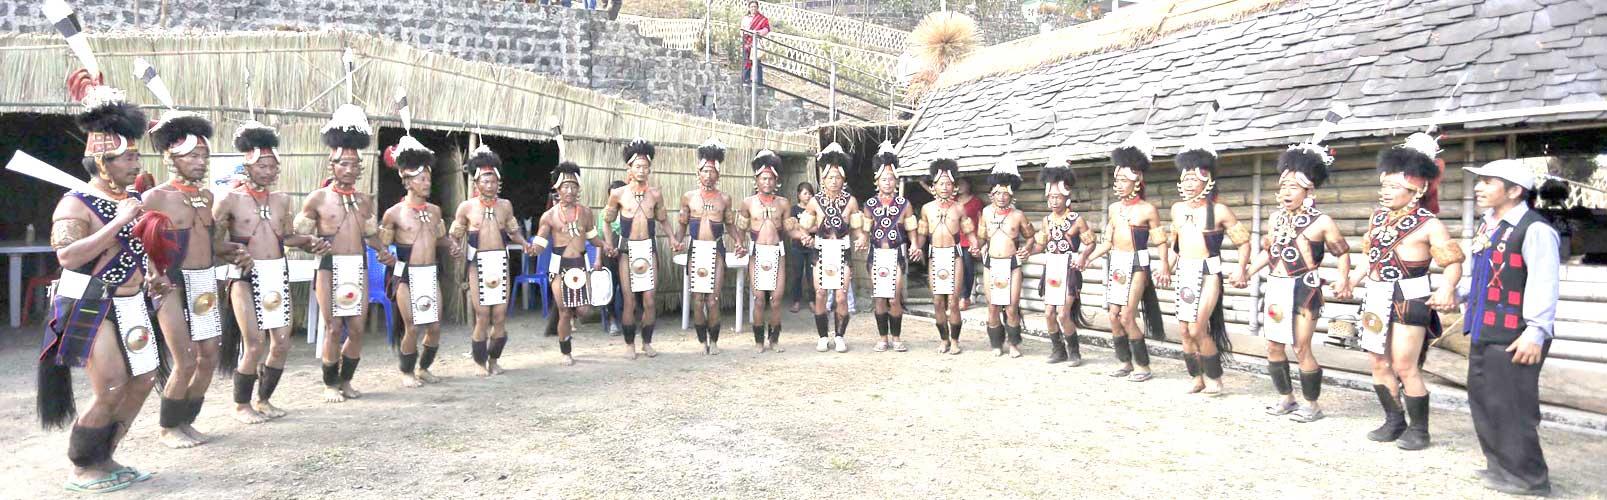 Nagaland - Hornbill Festival Kohima